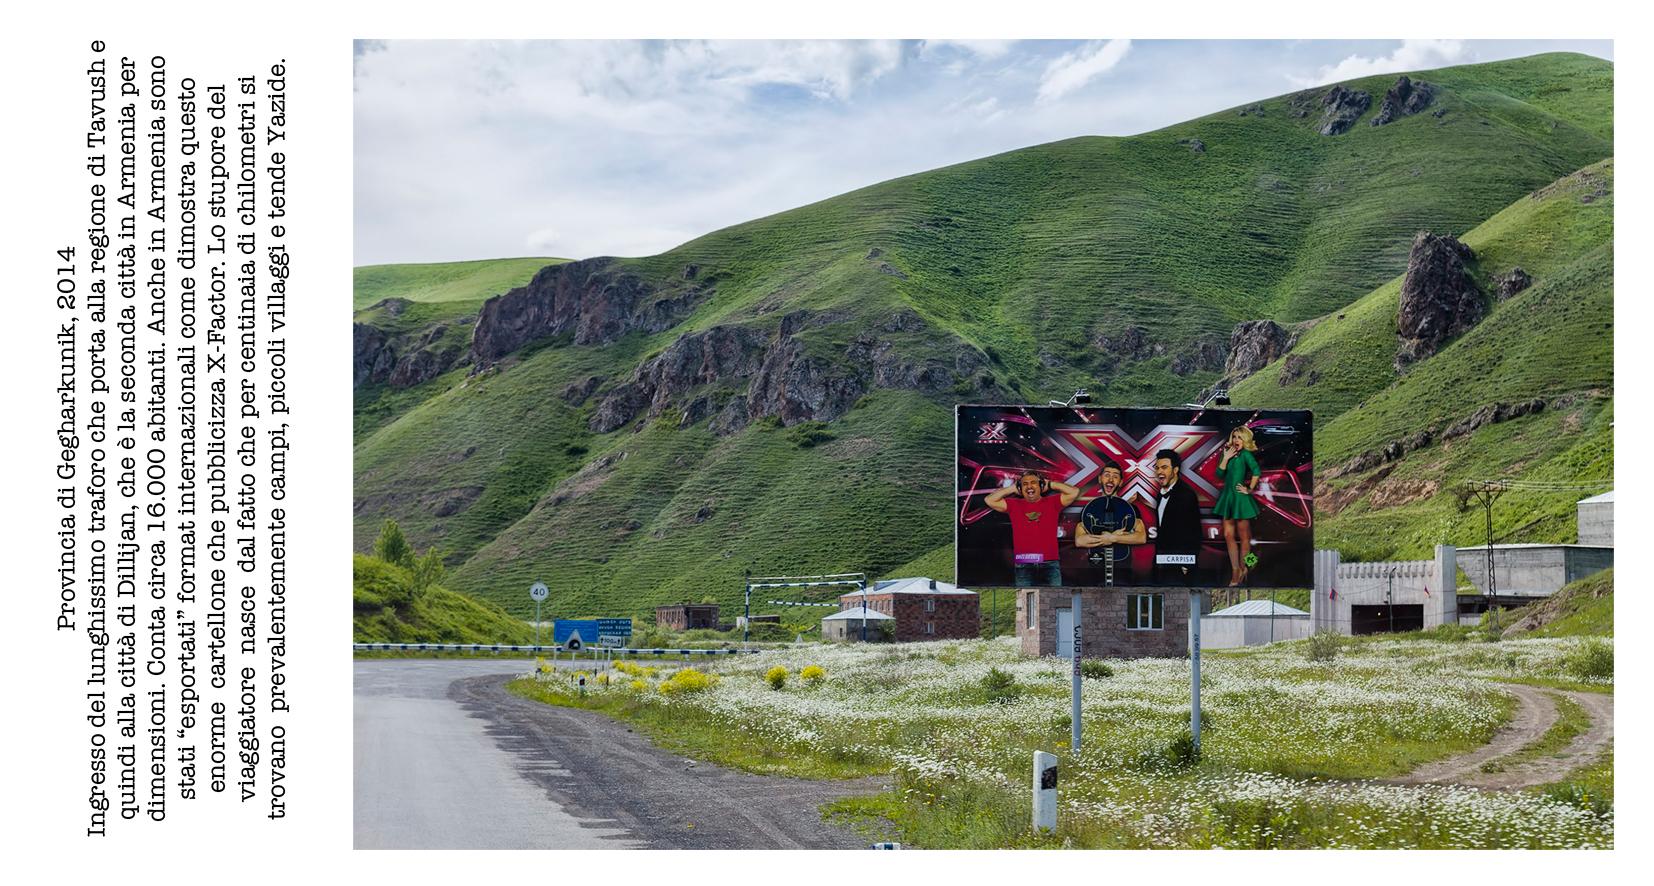 Viaggio-in-Armenia-11.jpg